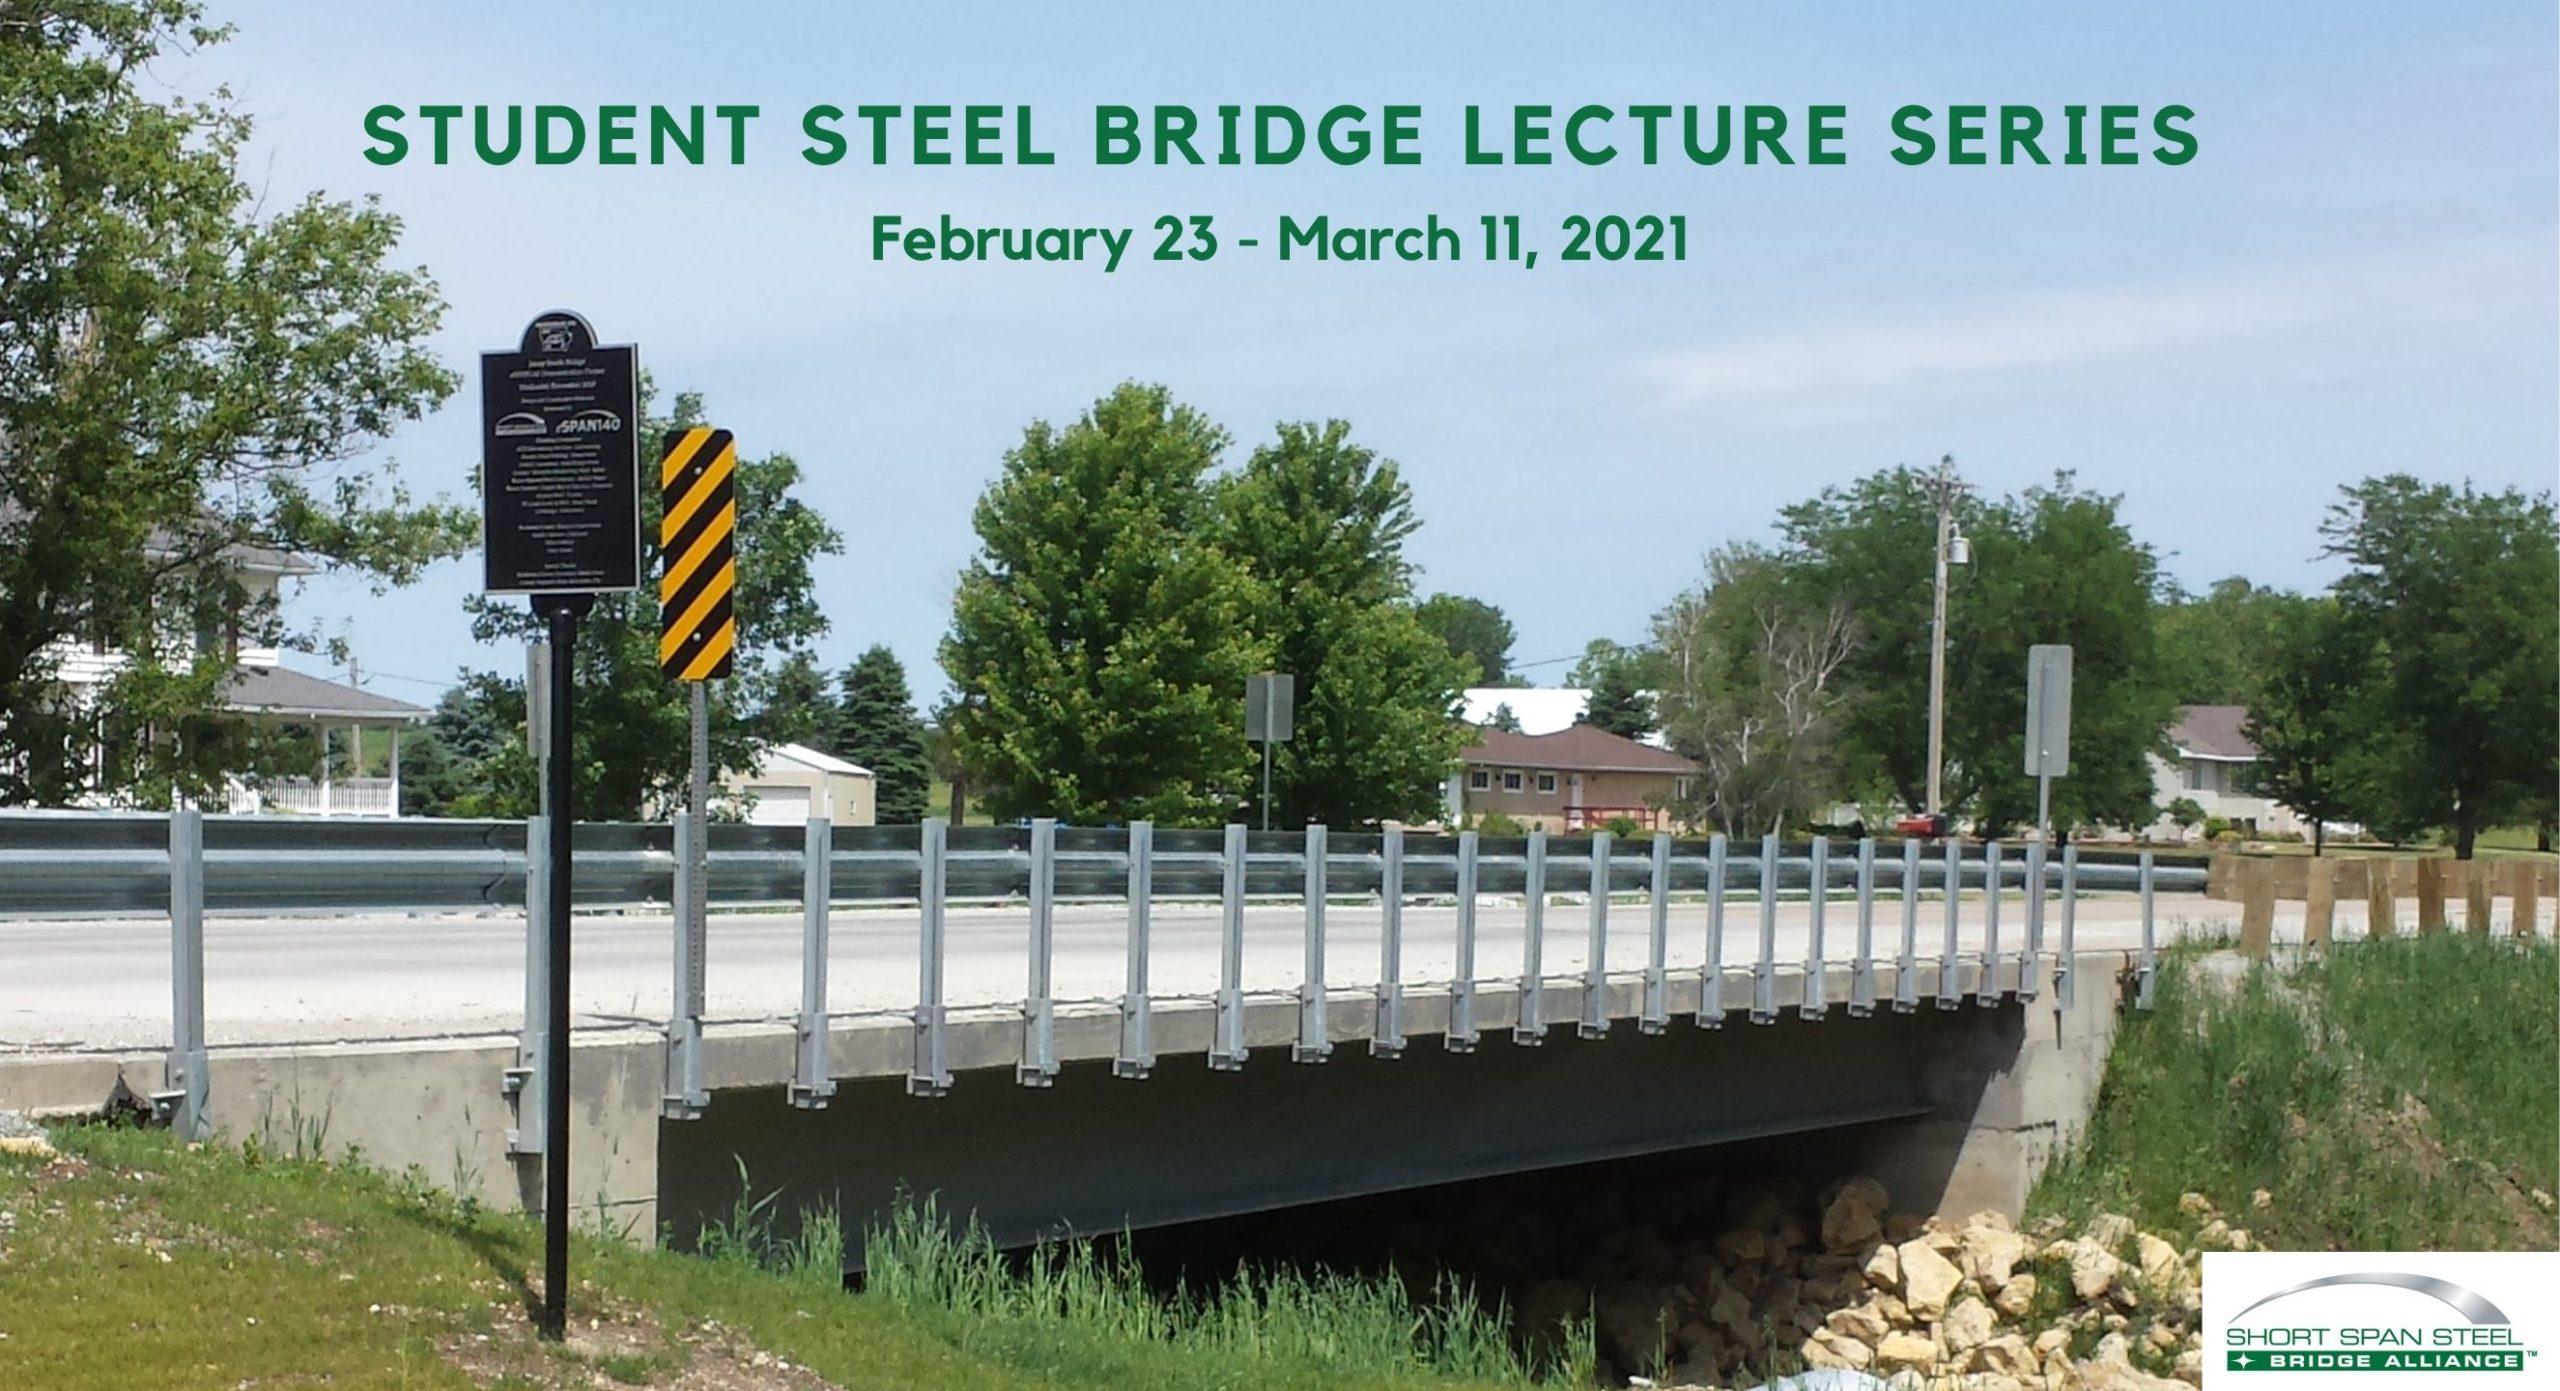 Student Steel Bridge Lecture Series